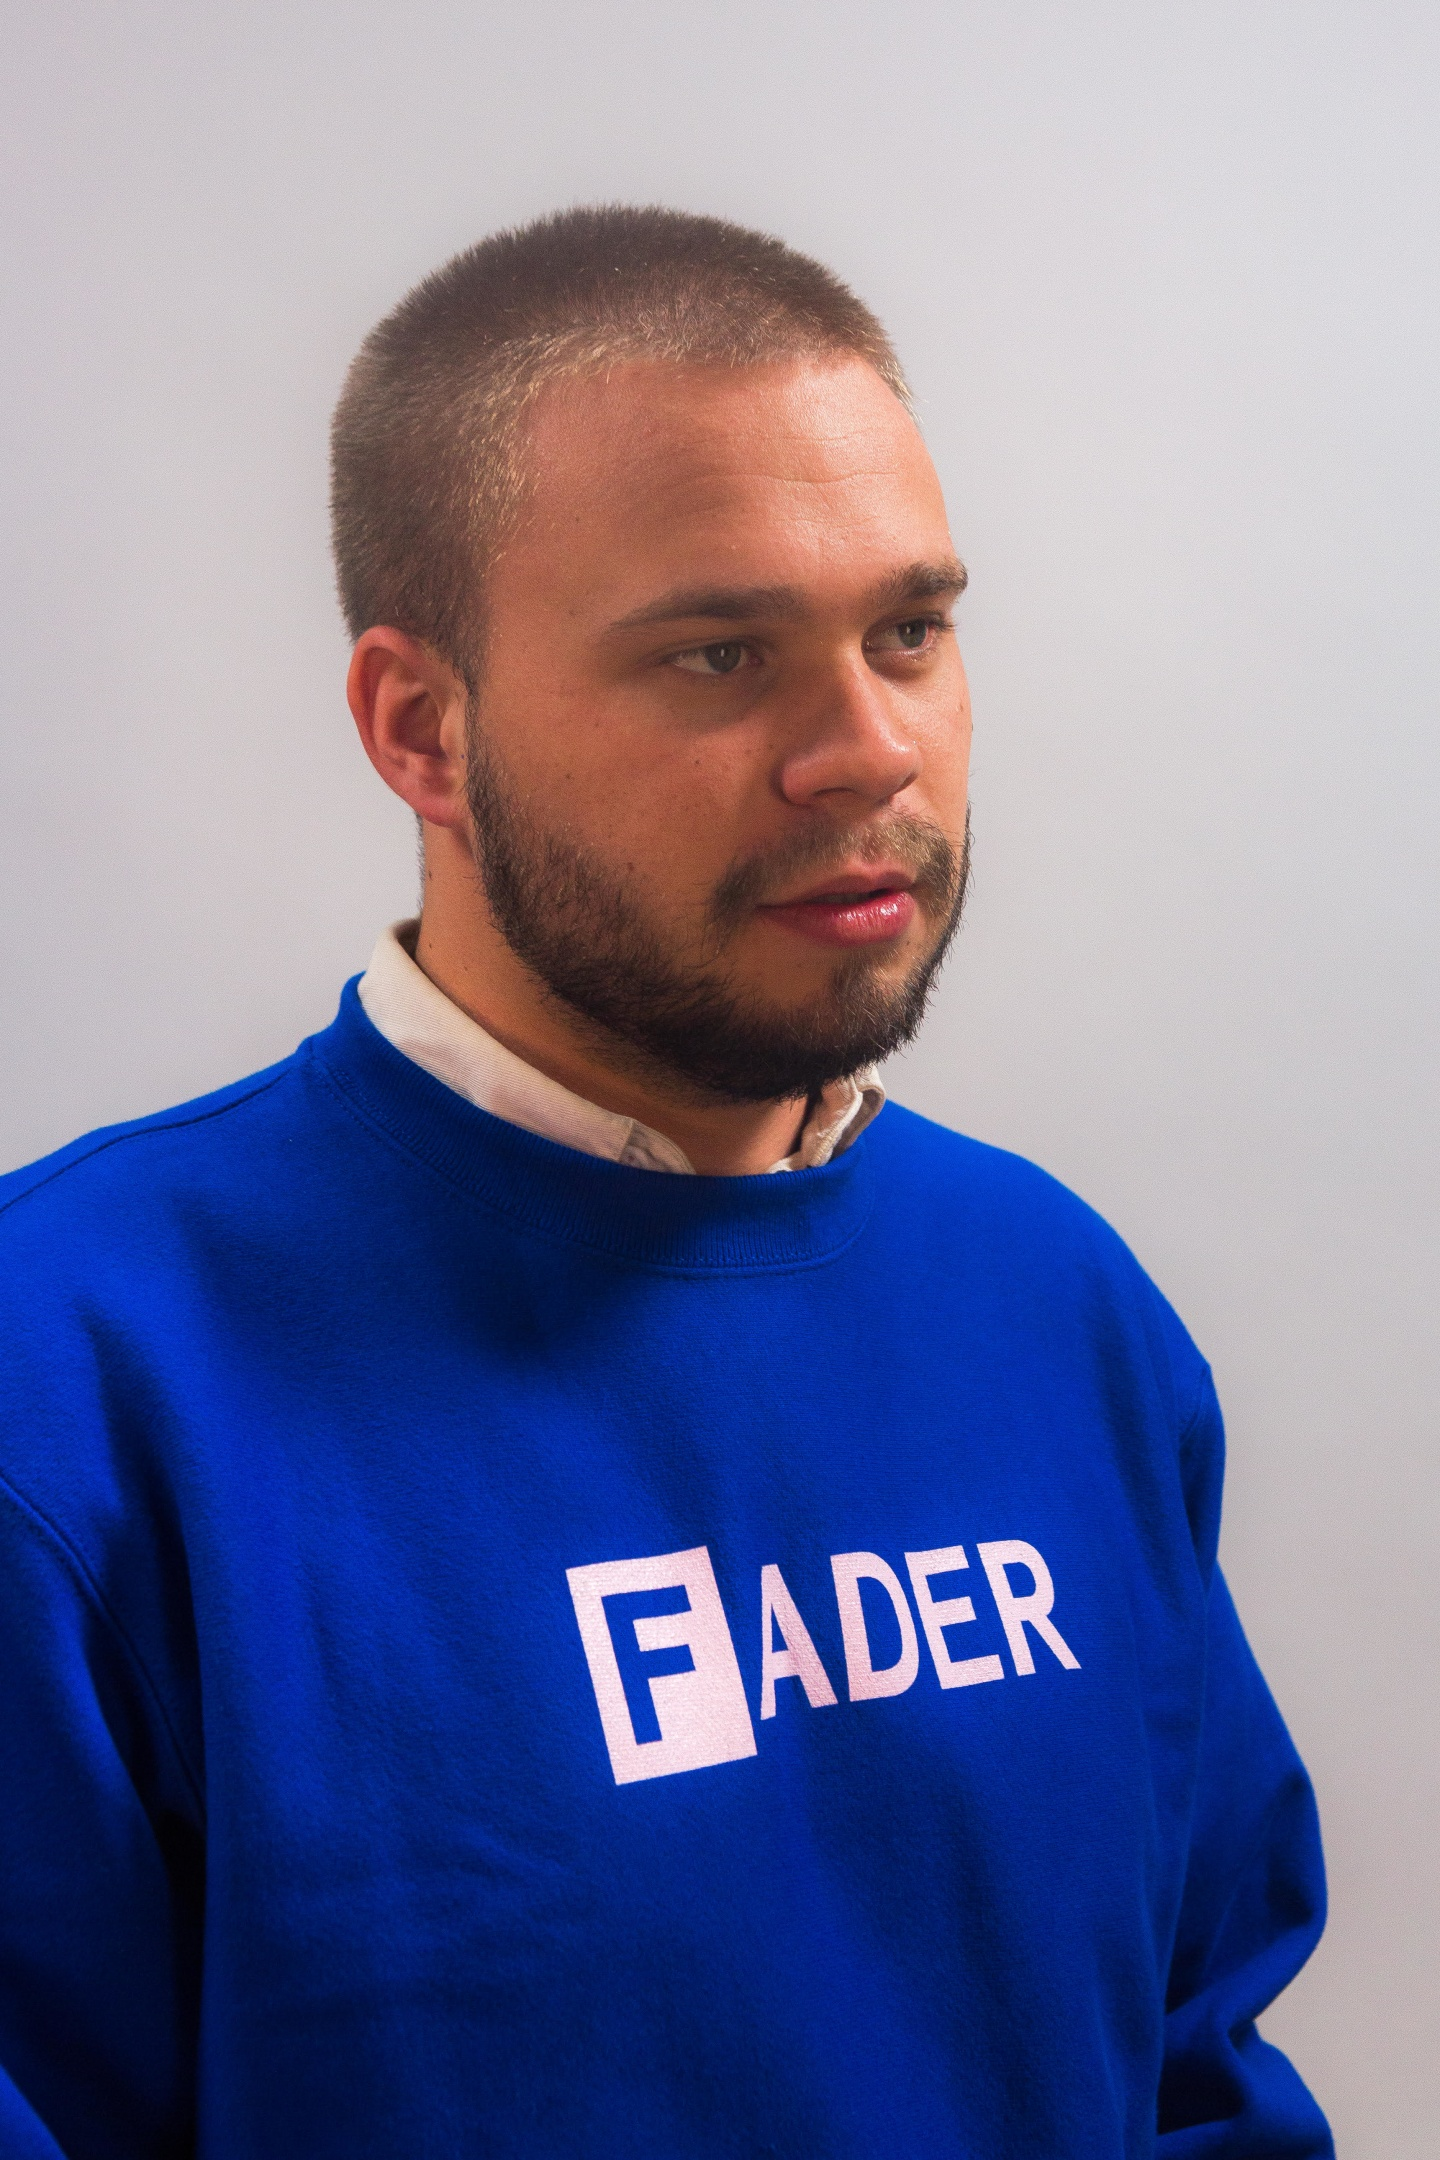 Cop a FADER x Champion crew neck sweatshirt